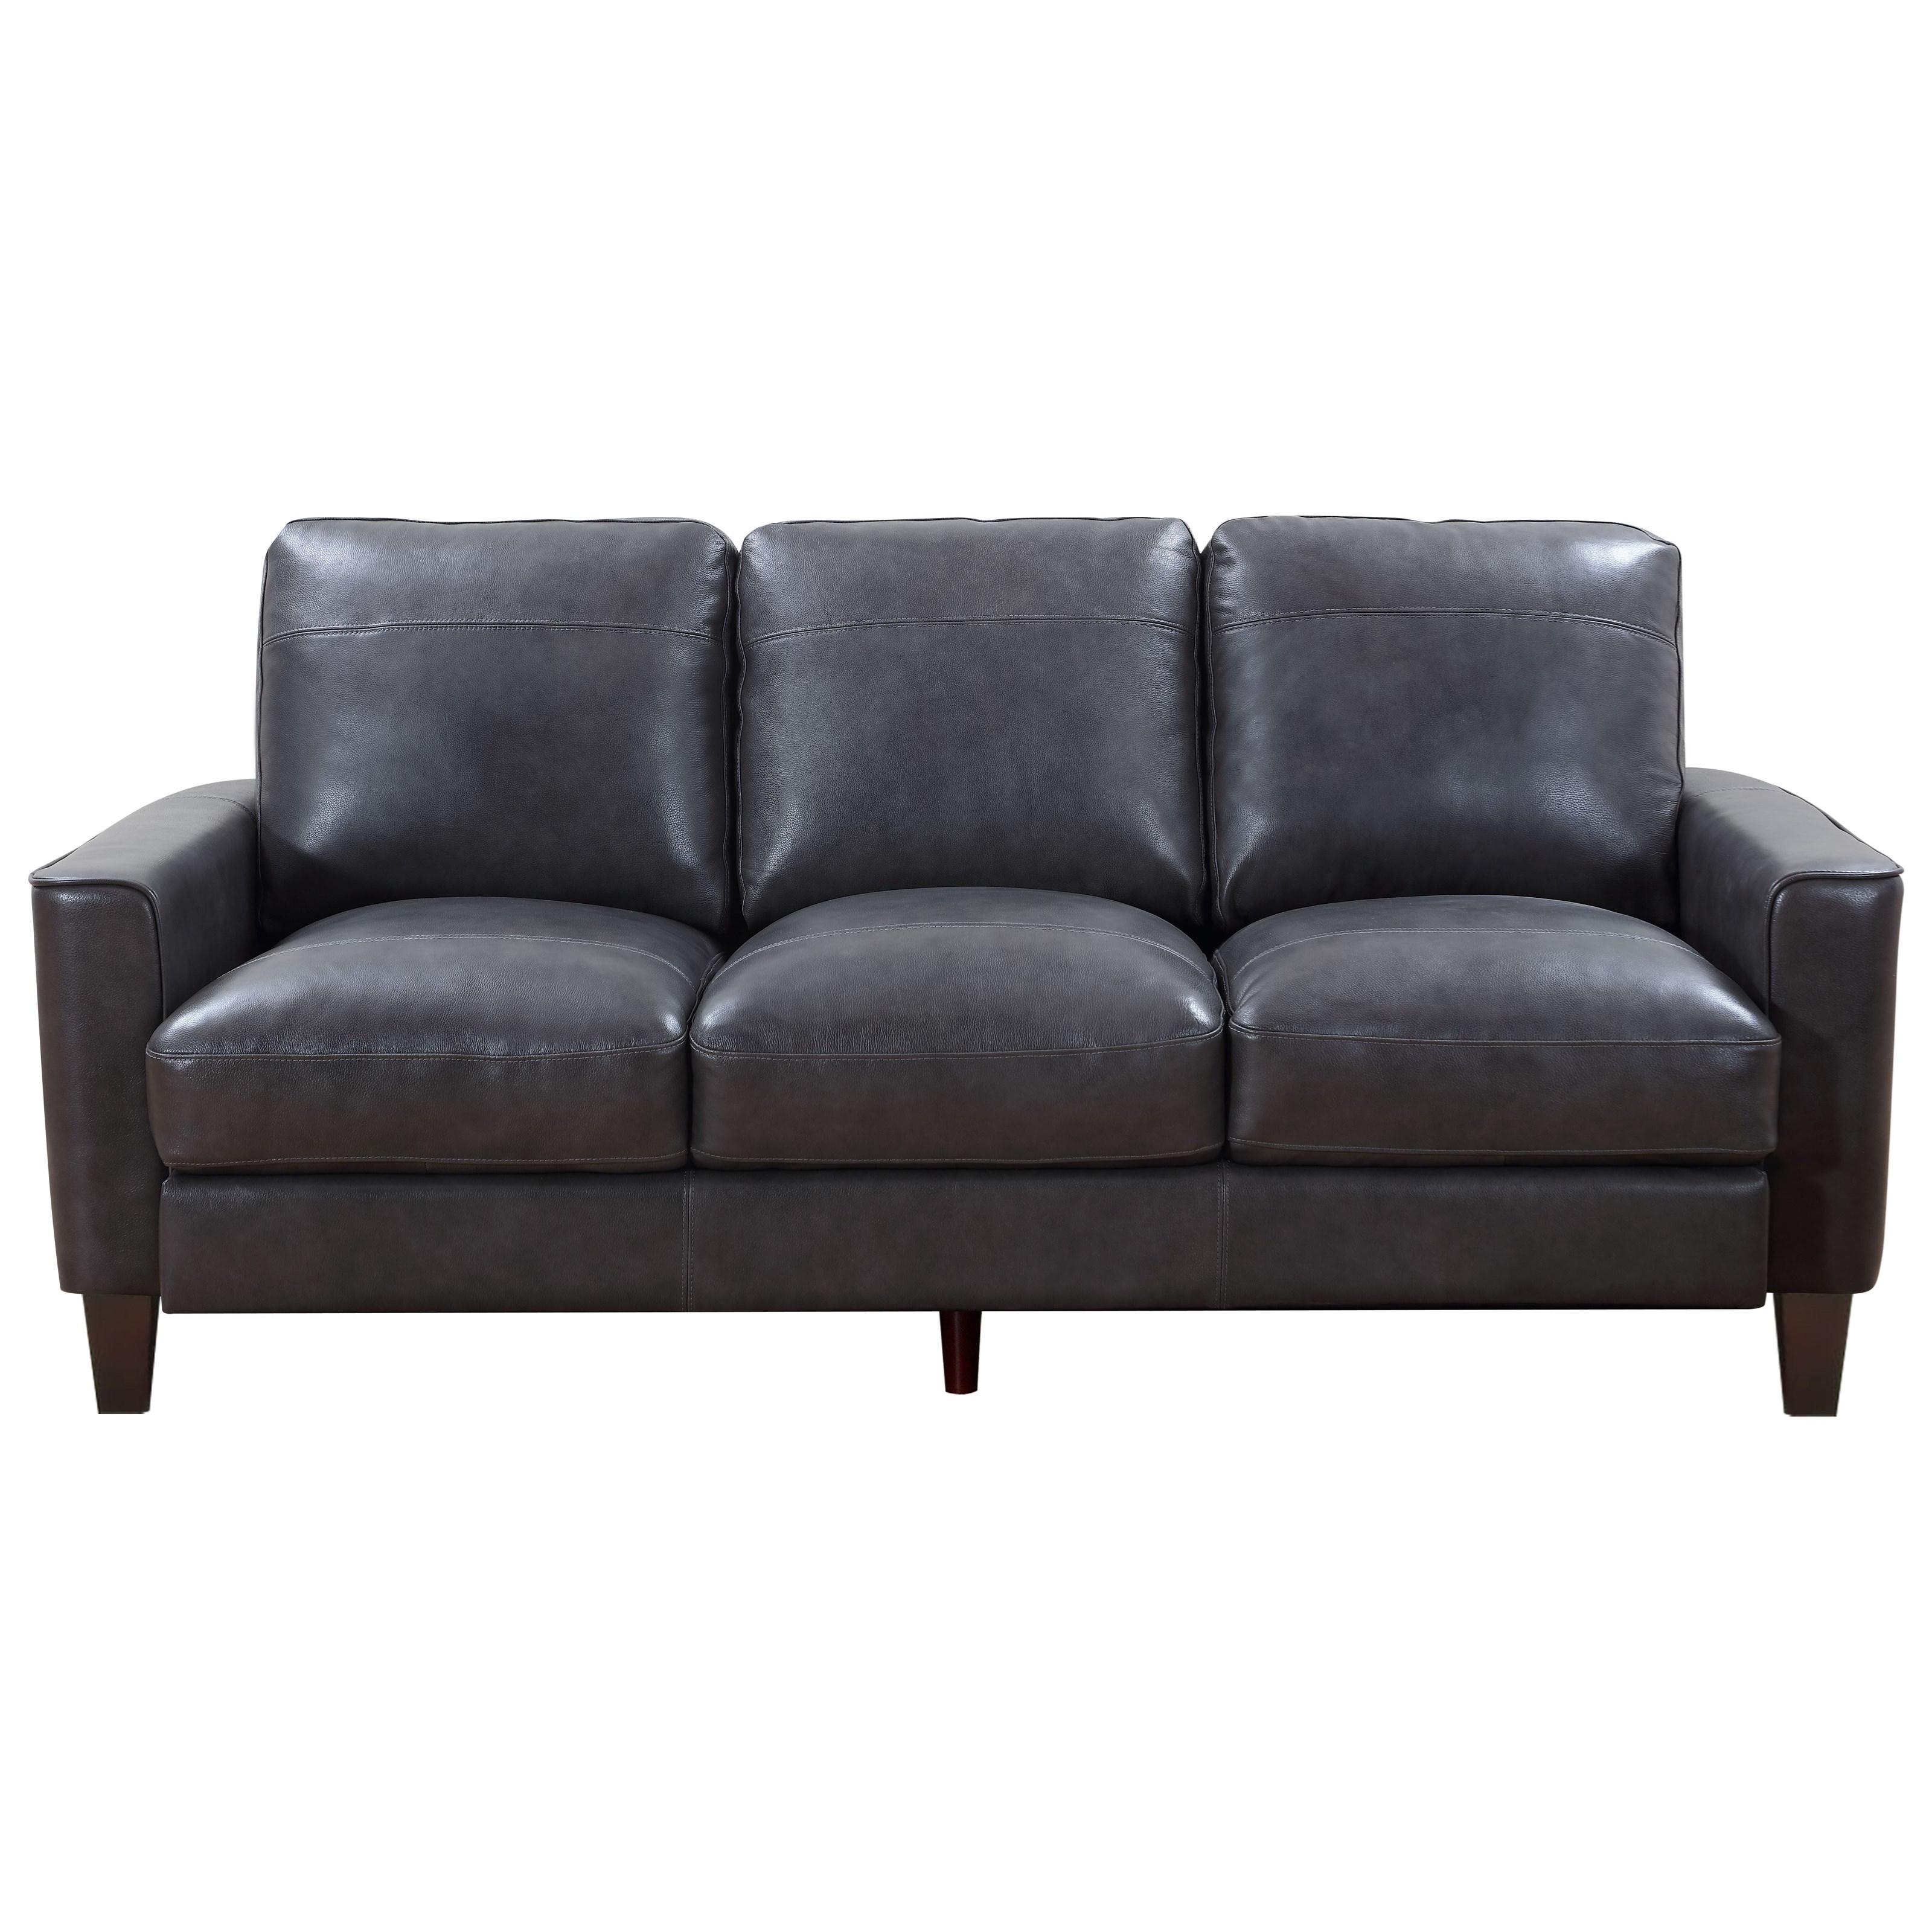 Georgetown - Chino Sofa by Leather Italia USA at Corner Furniture